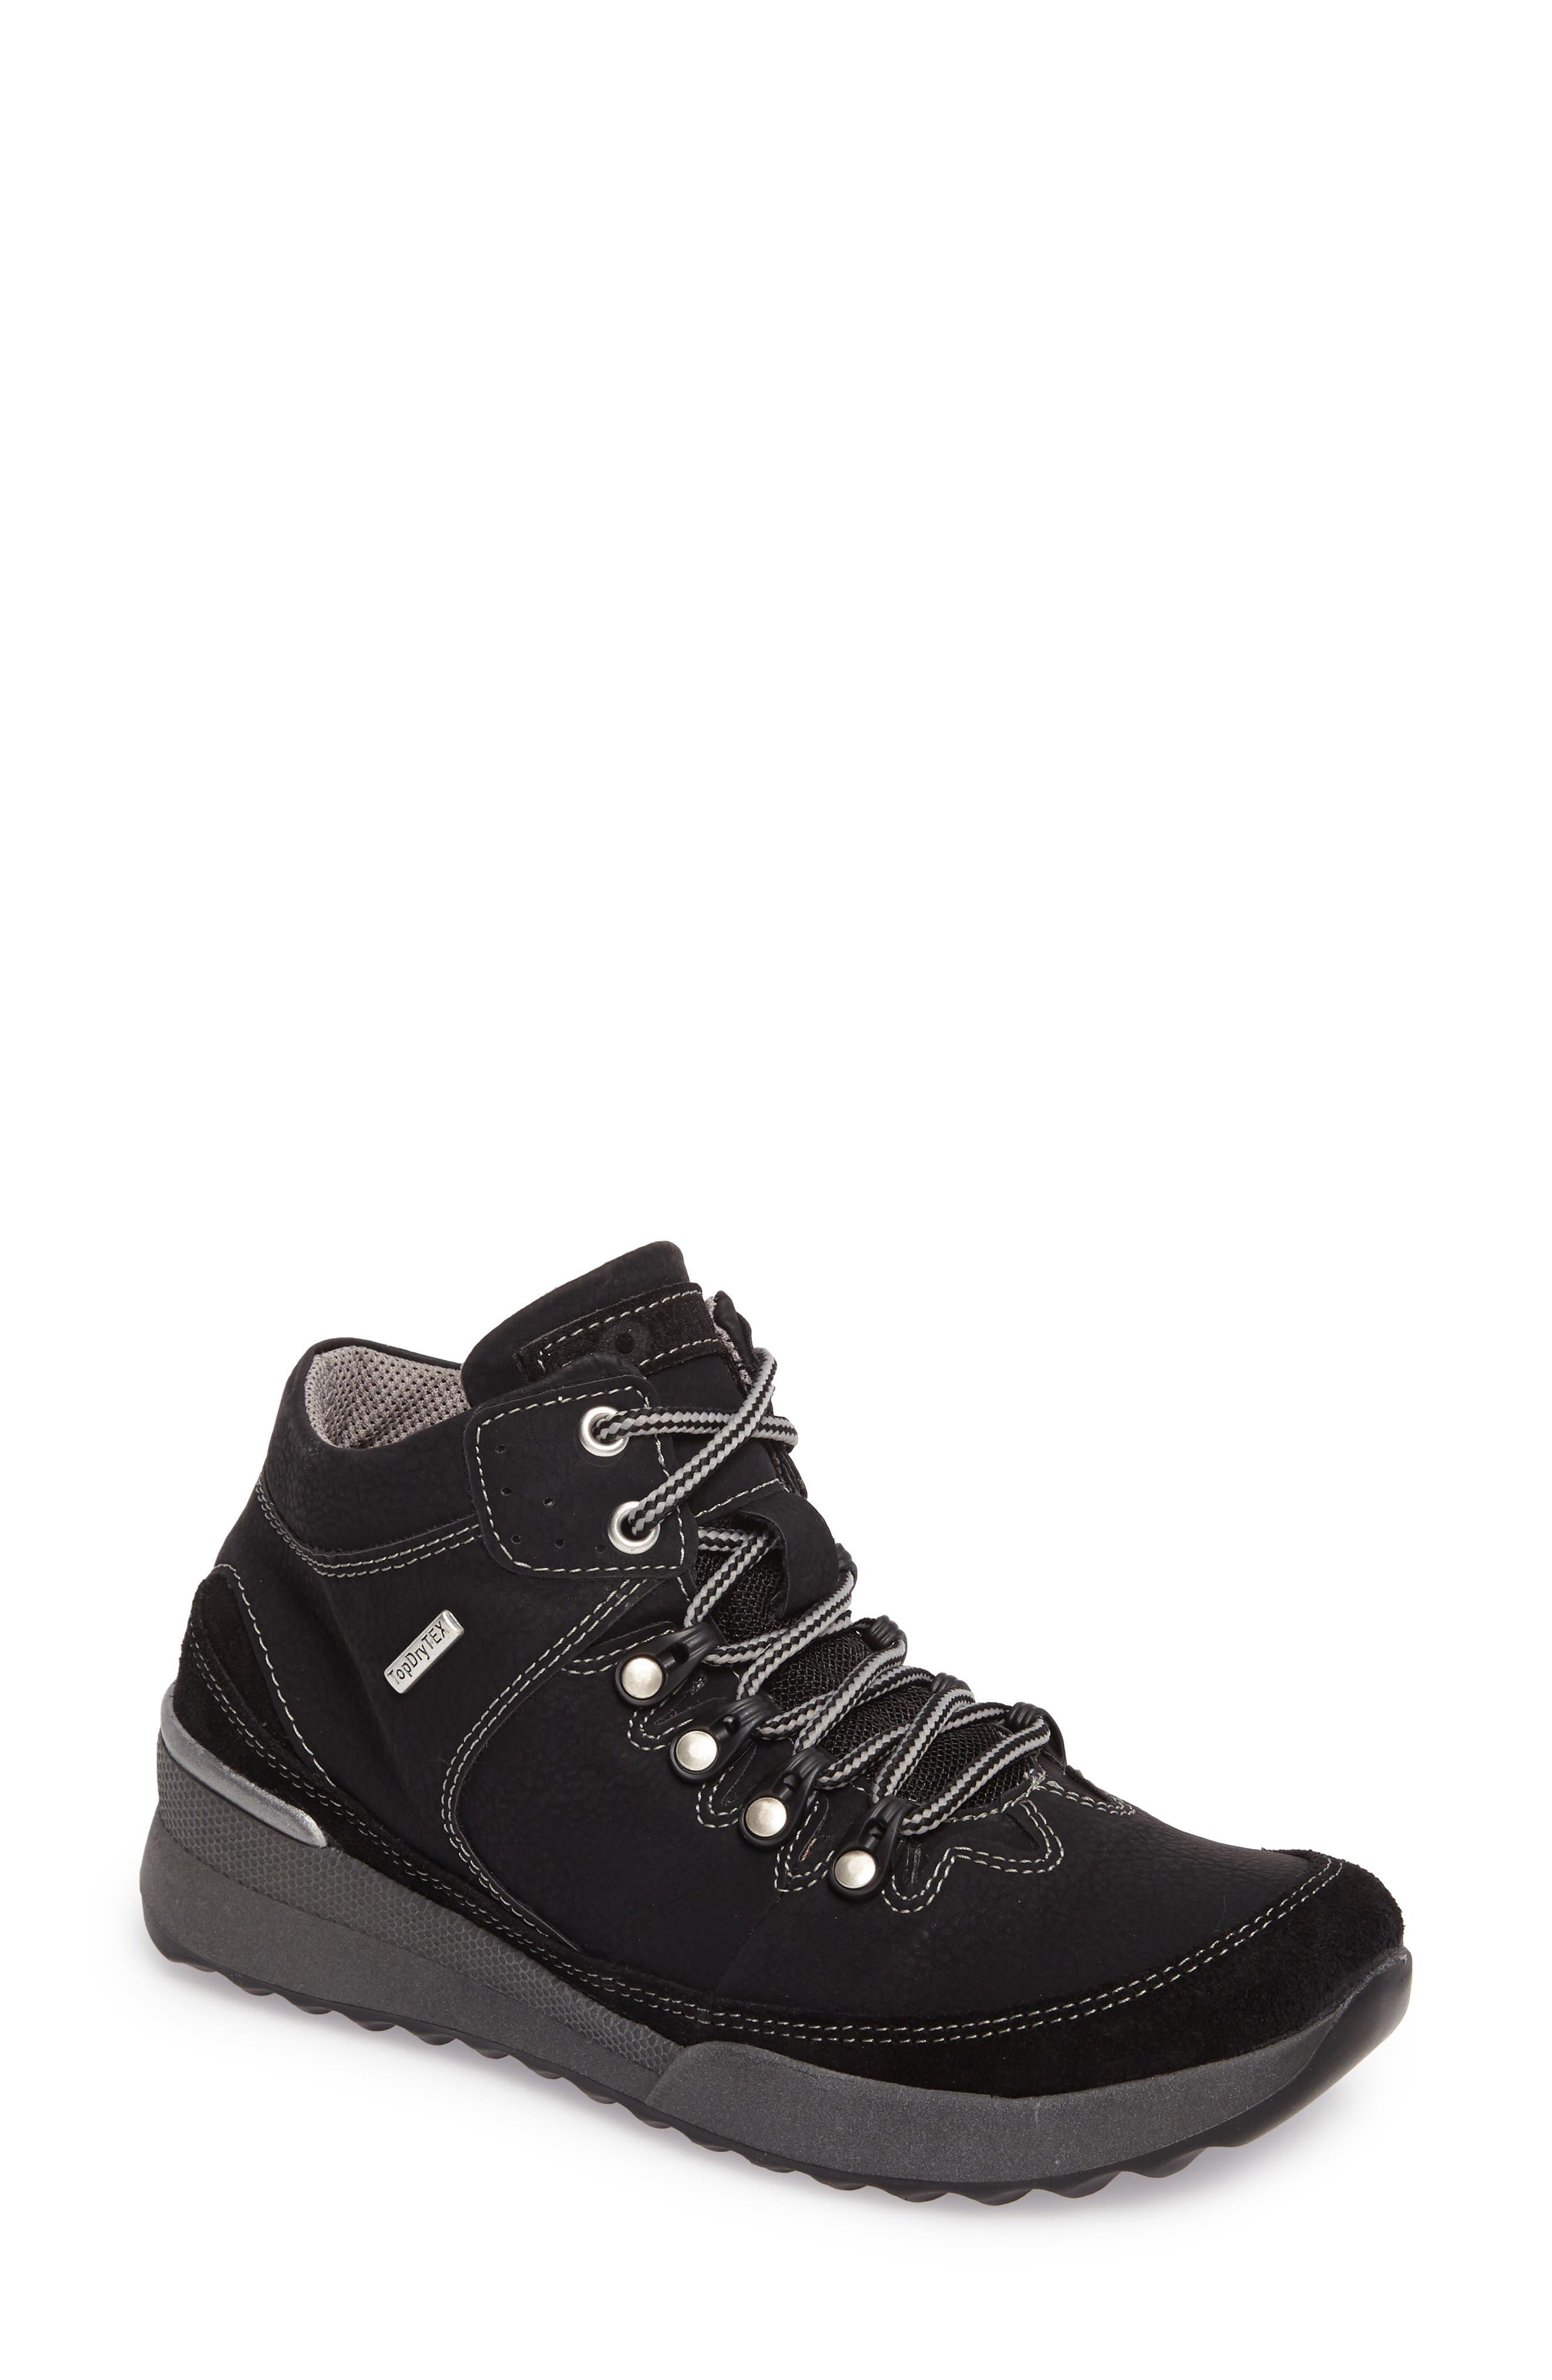 Romika® Victoria 05 Waterproof Sneaker (Women)